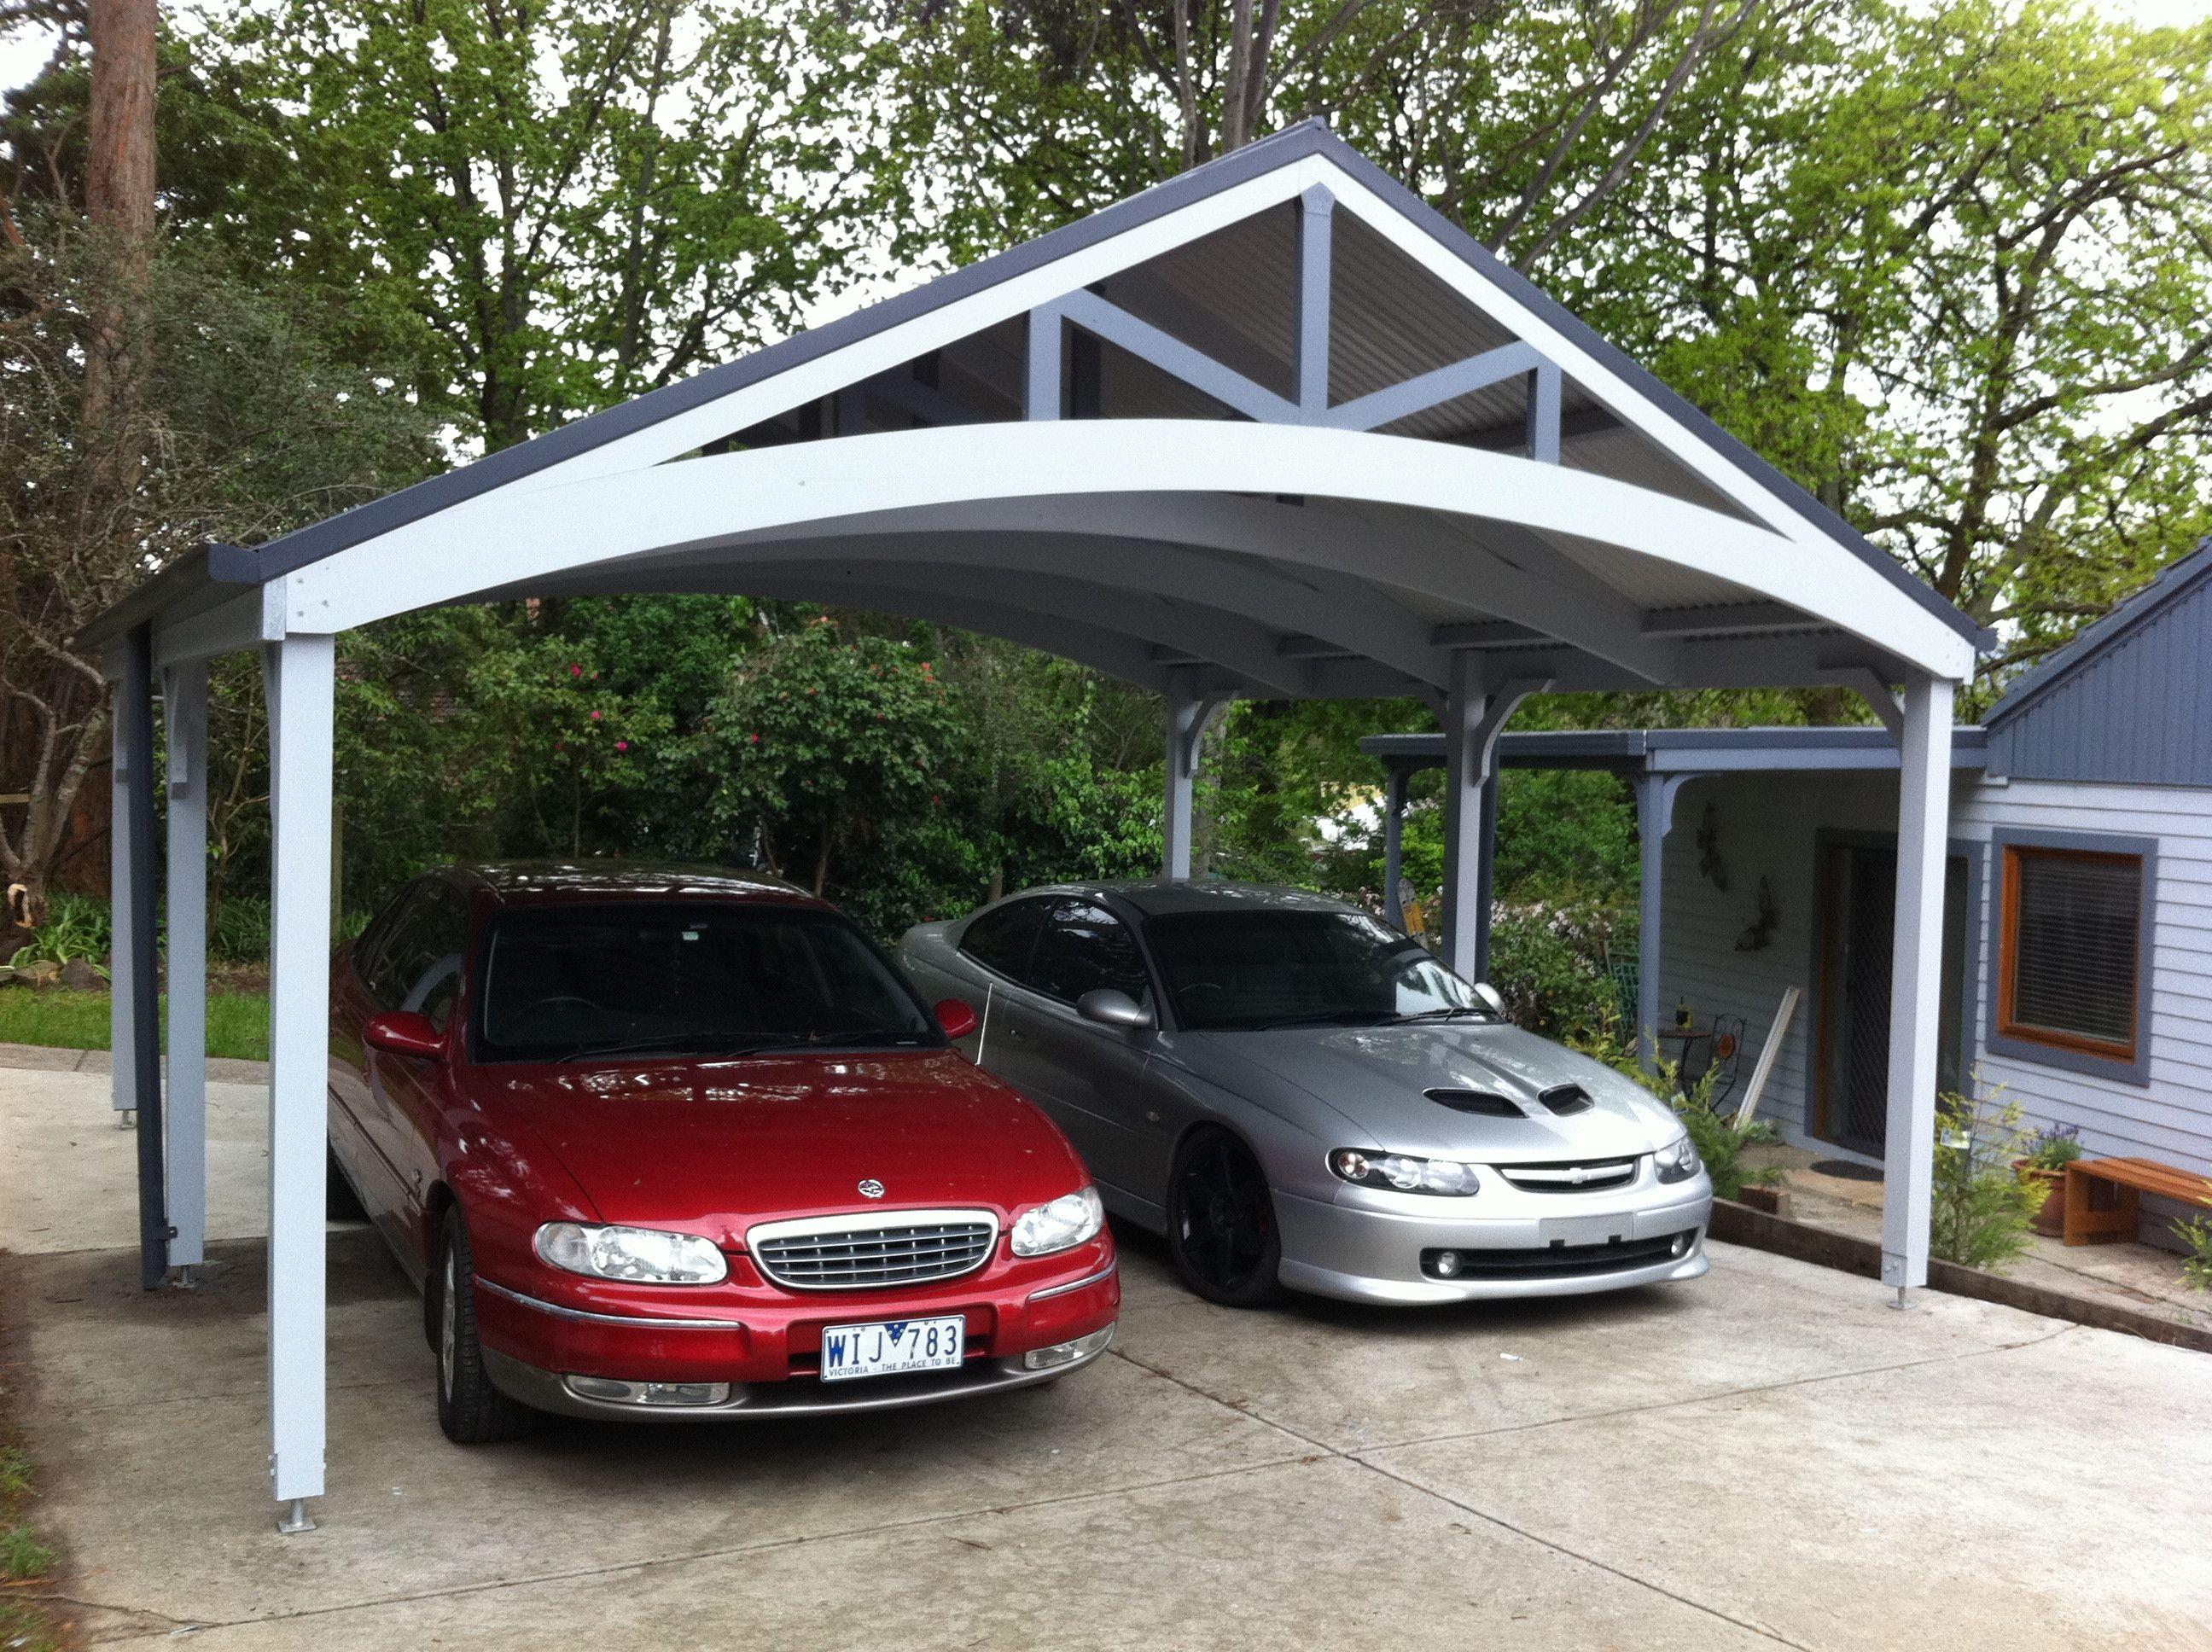 20 Ideas for Diy Metal Carport Kits Diy carport, Diy